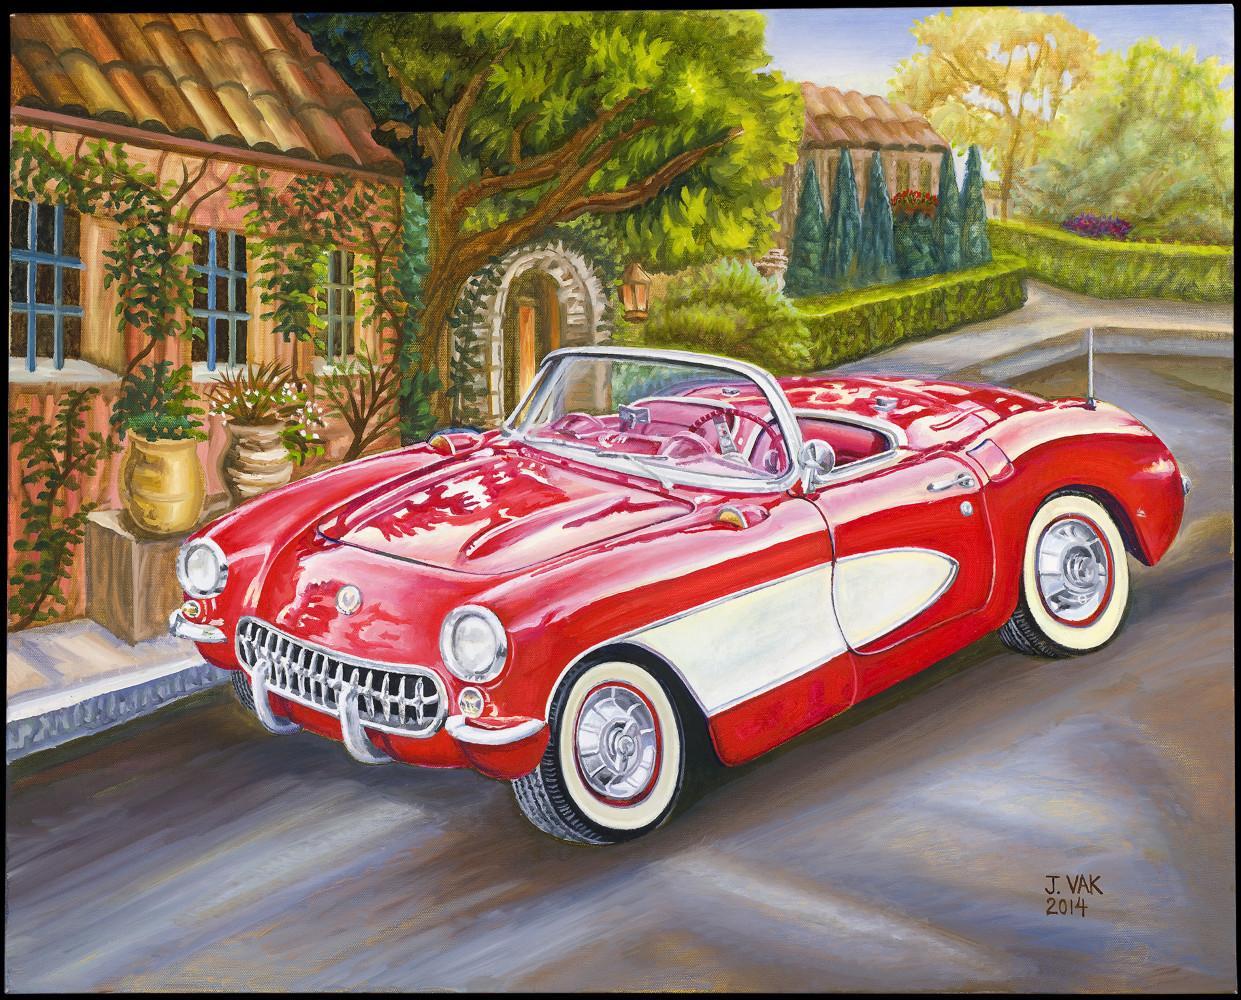 1956 Chevrolet Corvette      24x30 Original Oil             $3600              2014